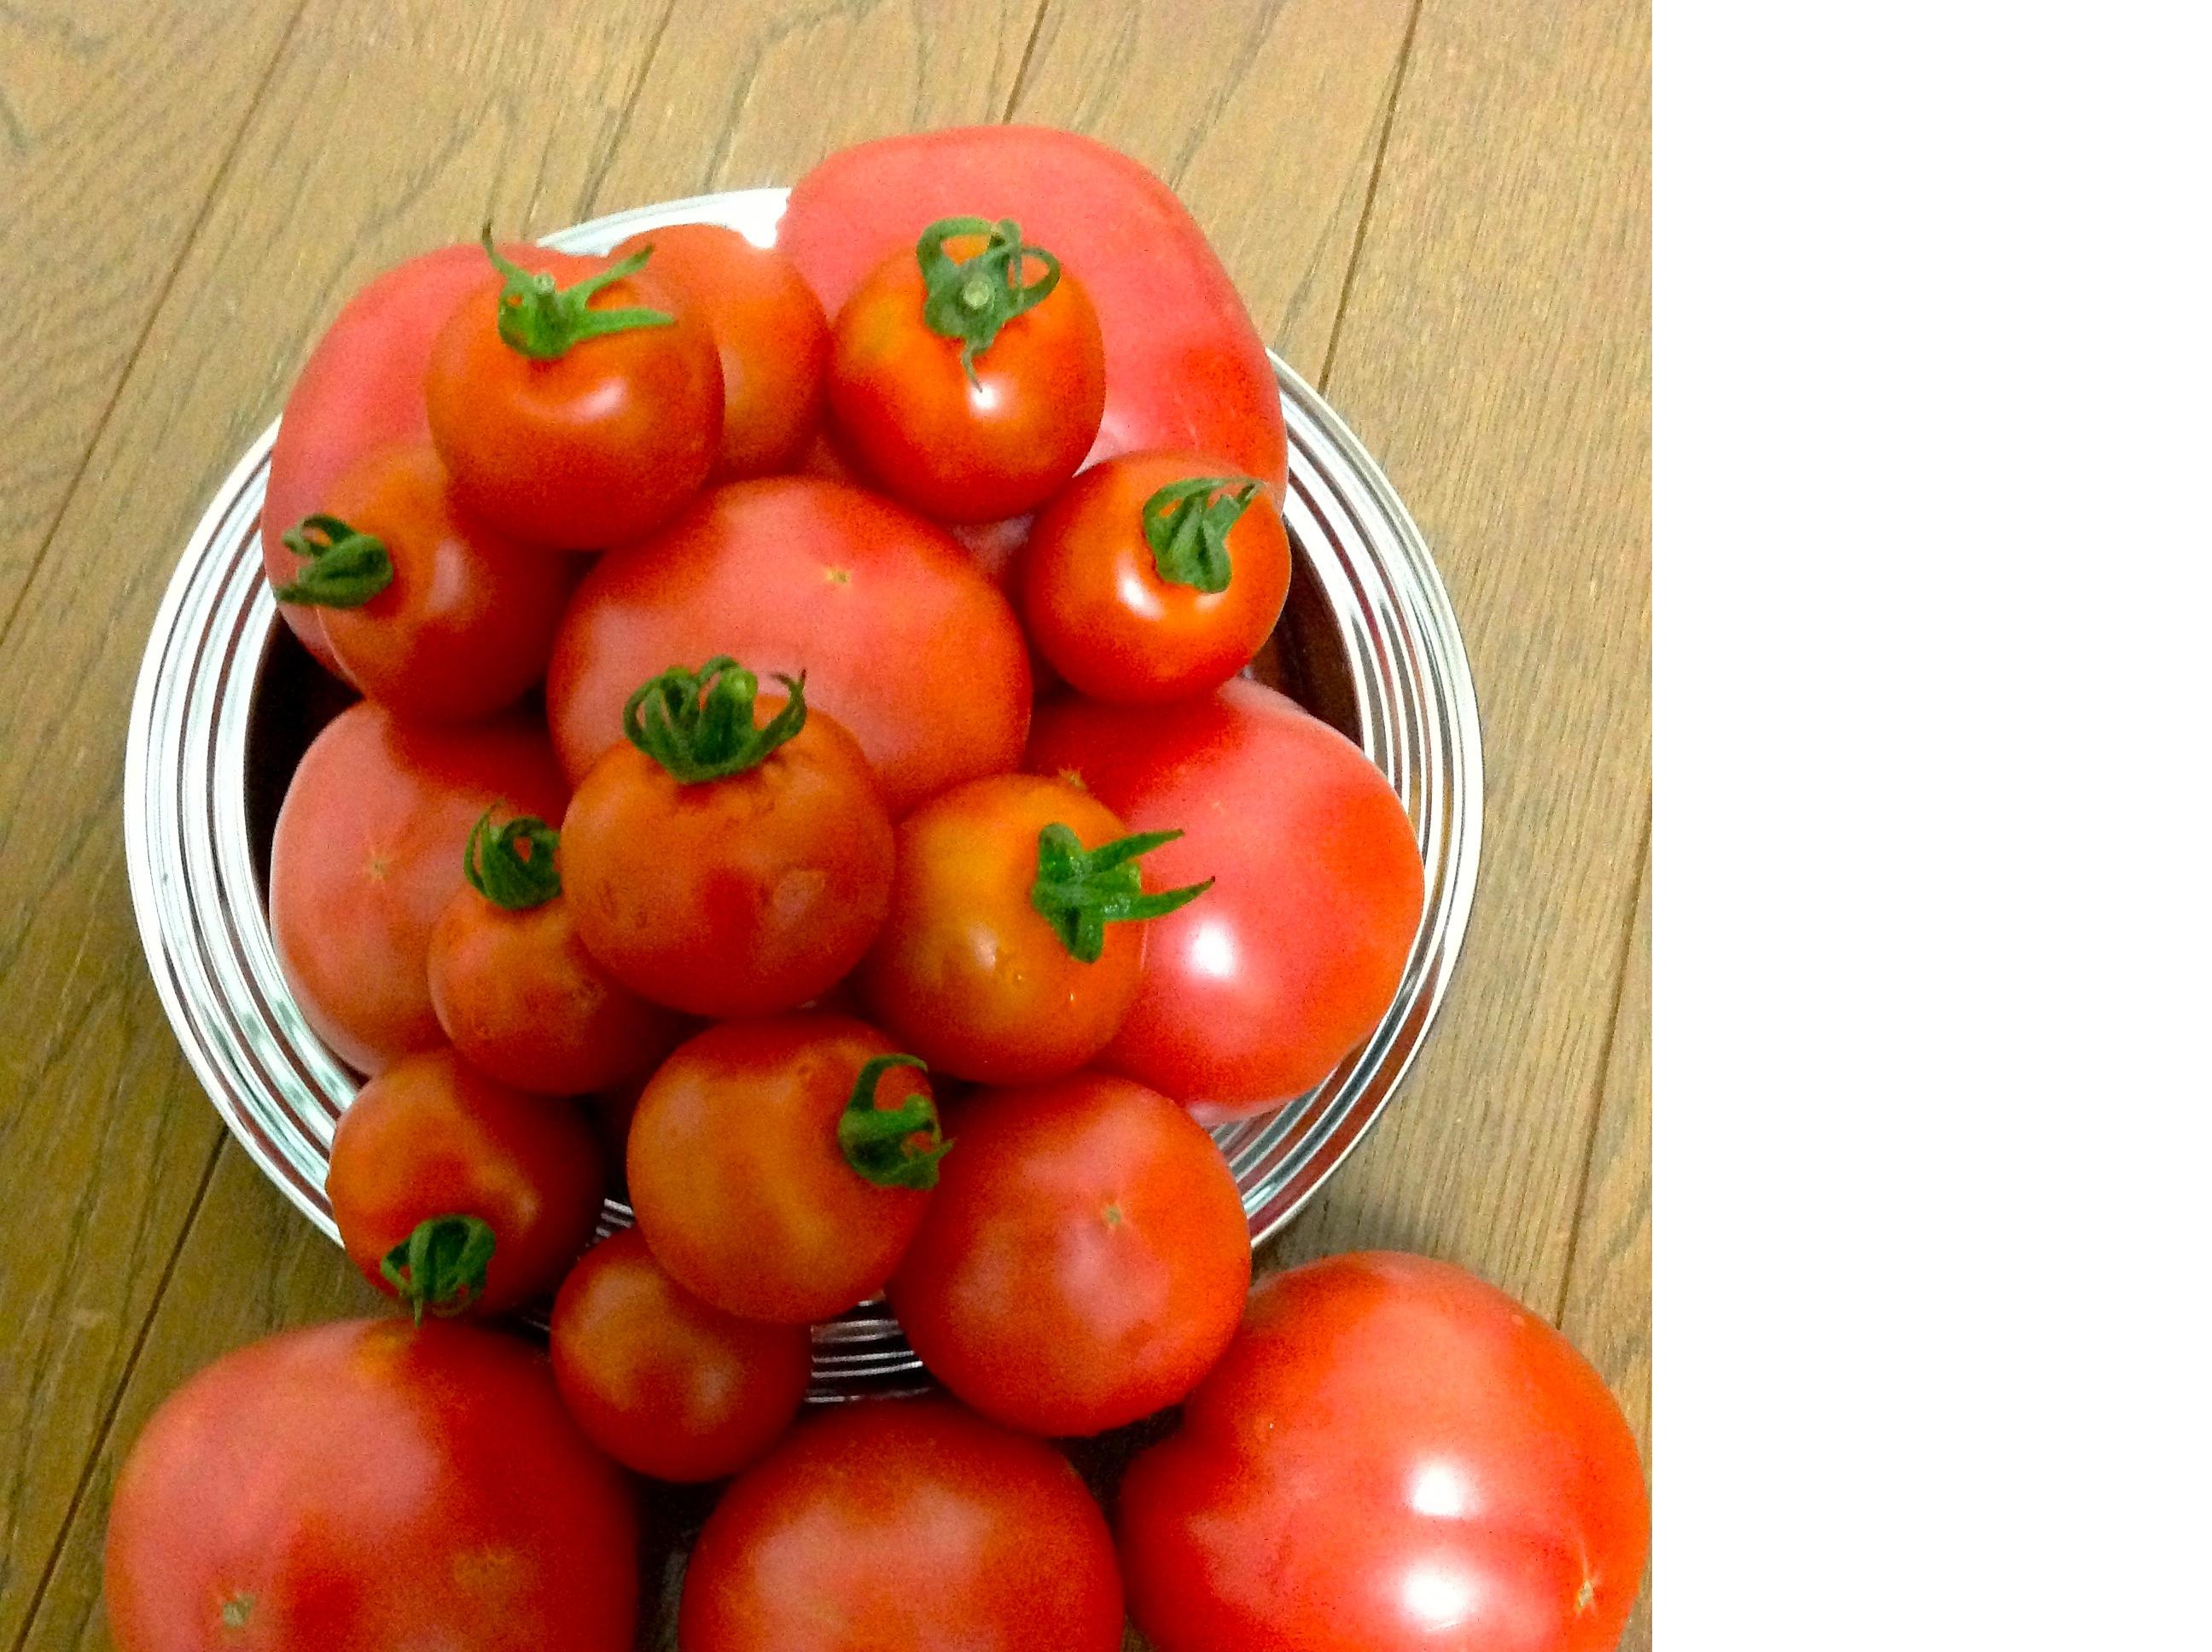 tomatojikka.jpg